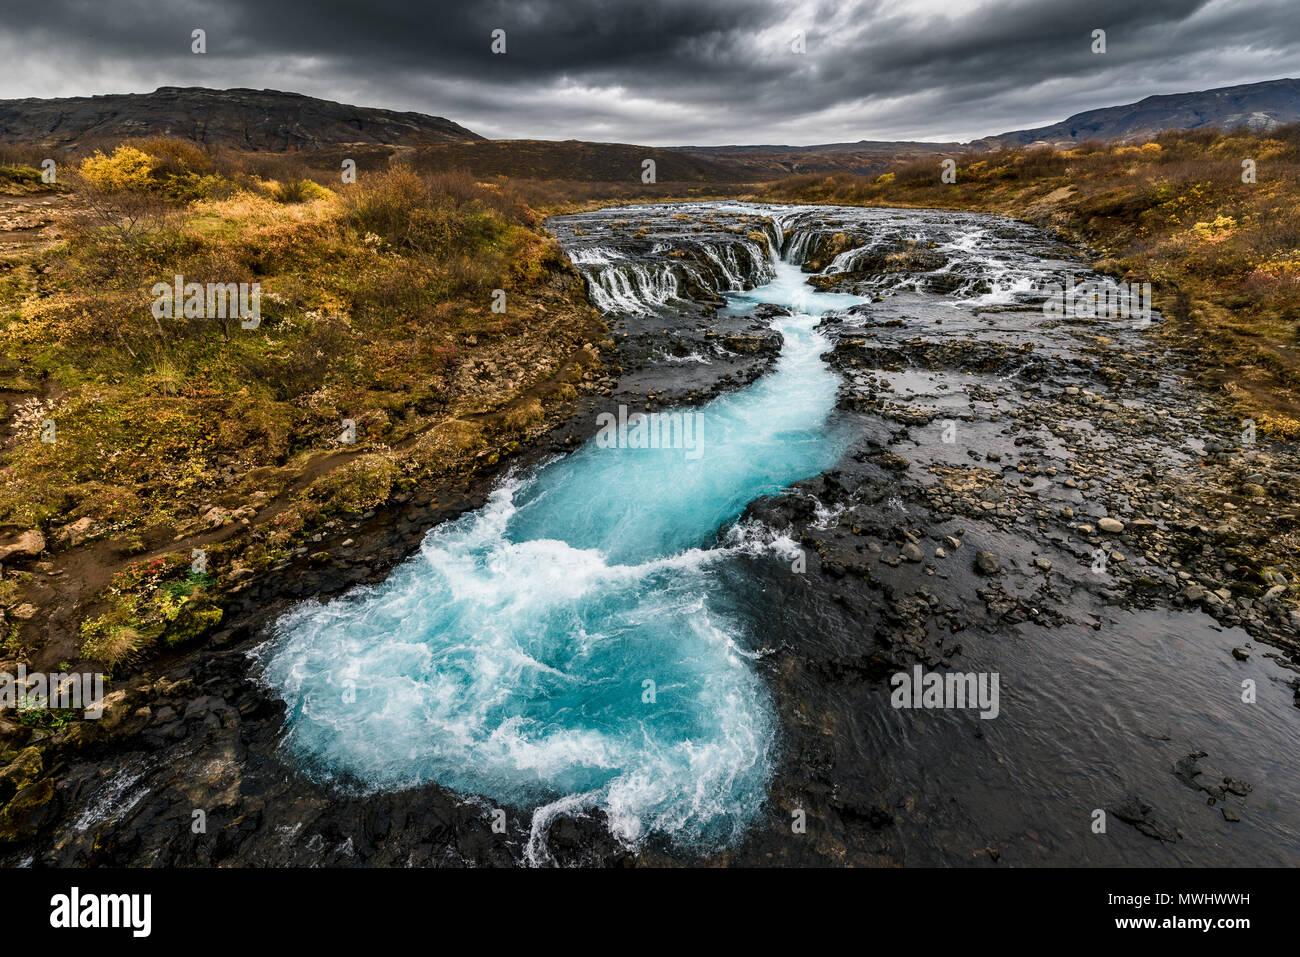 Natürlichen Whirlpool bruarfoss, Island Stockbild